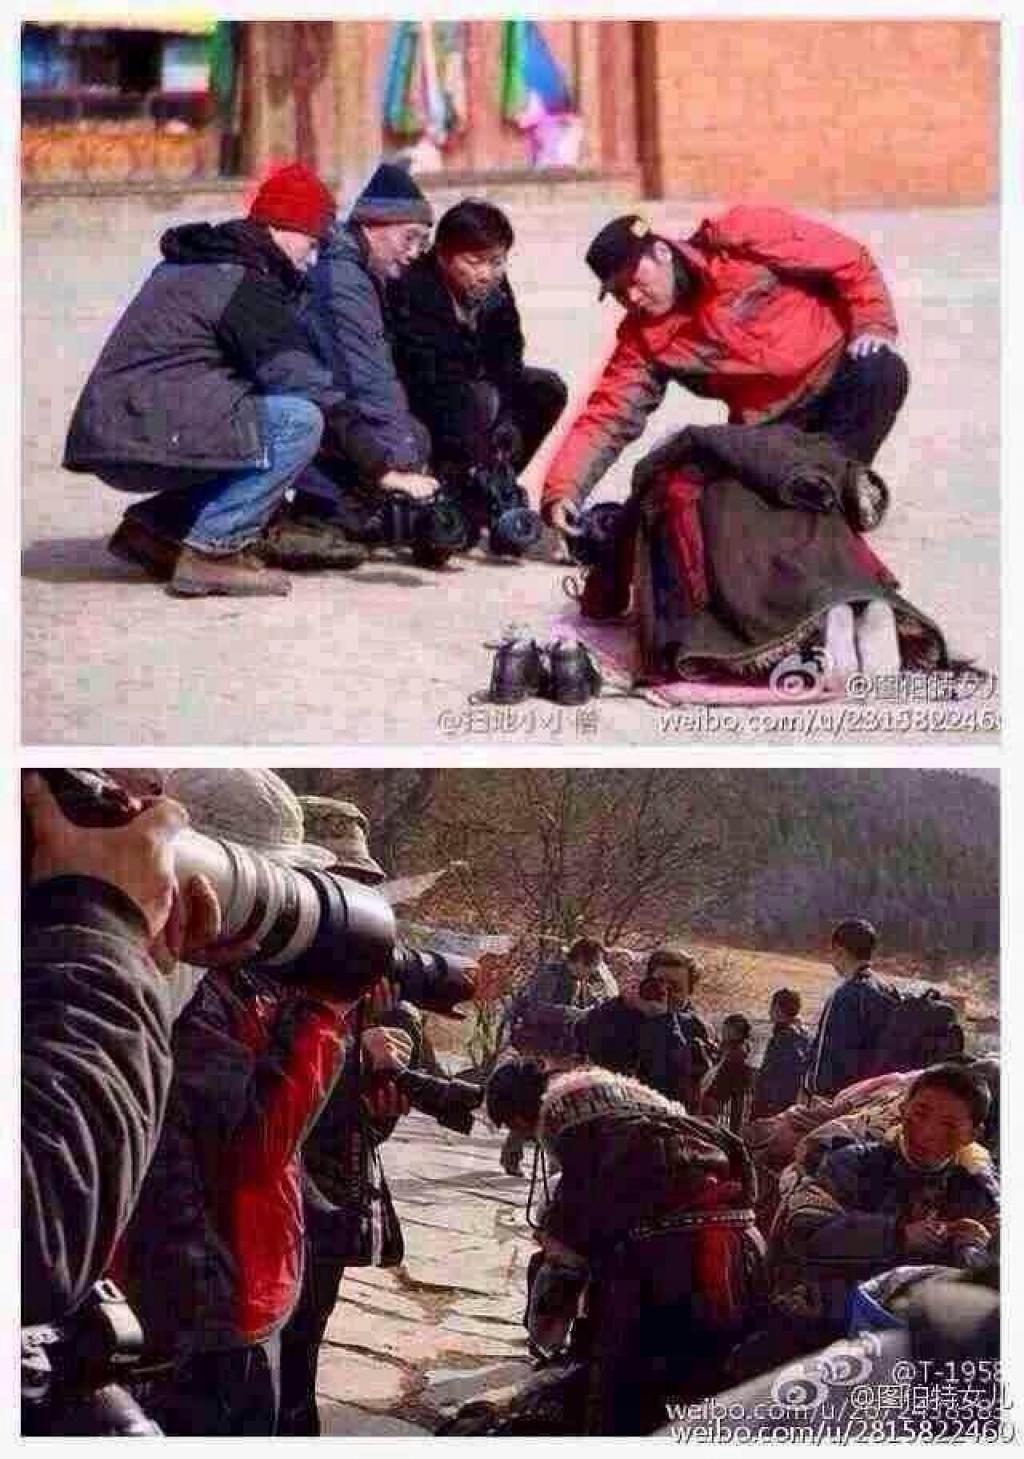 Tibet woman prays while tourists shoot pics